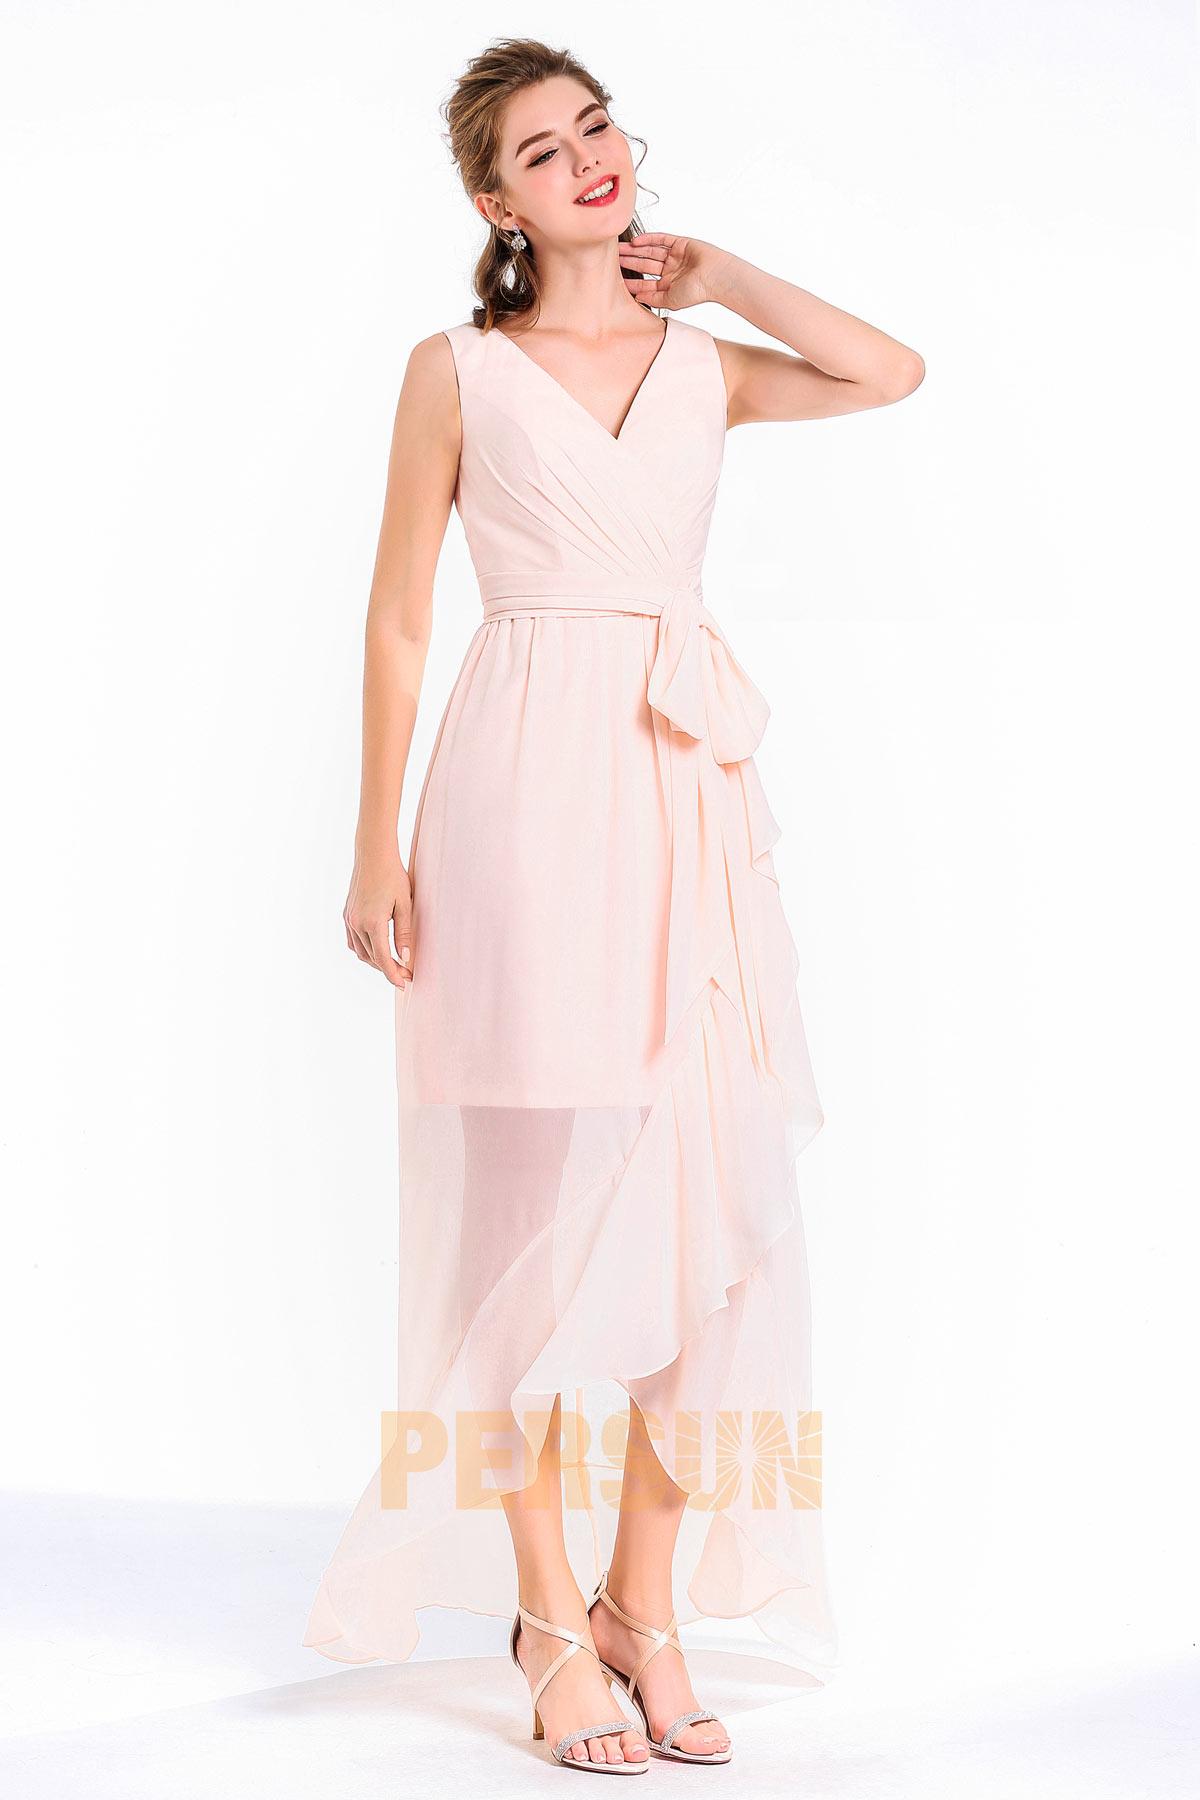 A-linie V-Ausschnitt lang schleife Band rosa Abendkleid aus Chiffon